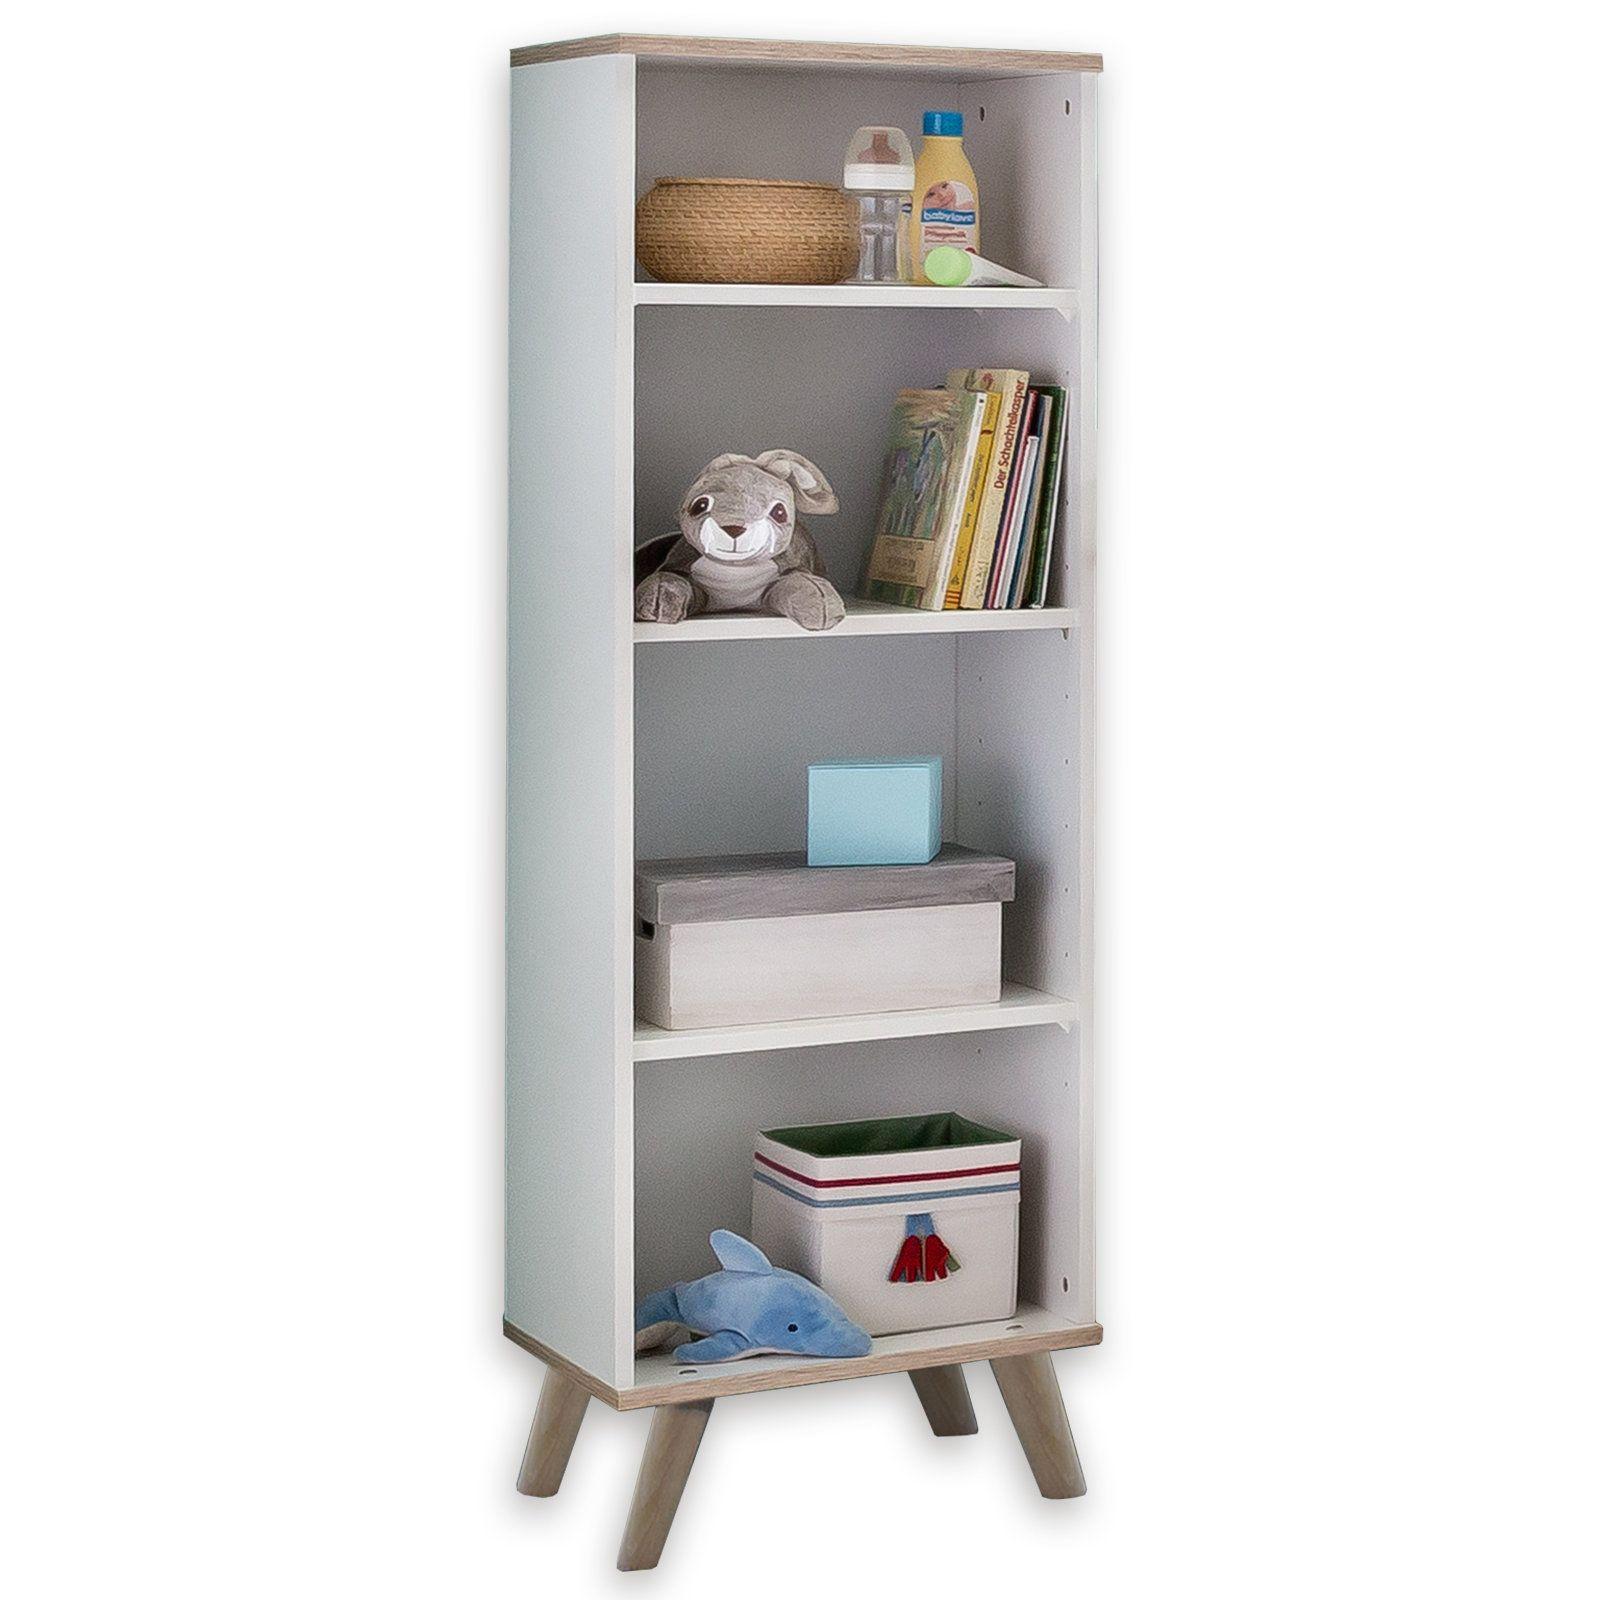 11 Genial Fotos Von Regal 55 Cm Breit Home Decor Shelves Bookcase